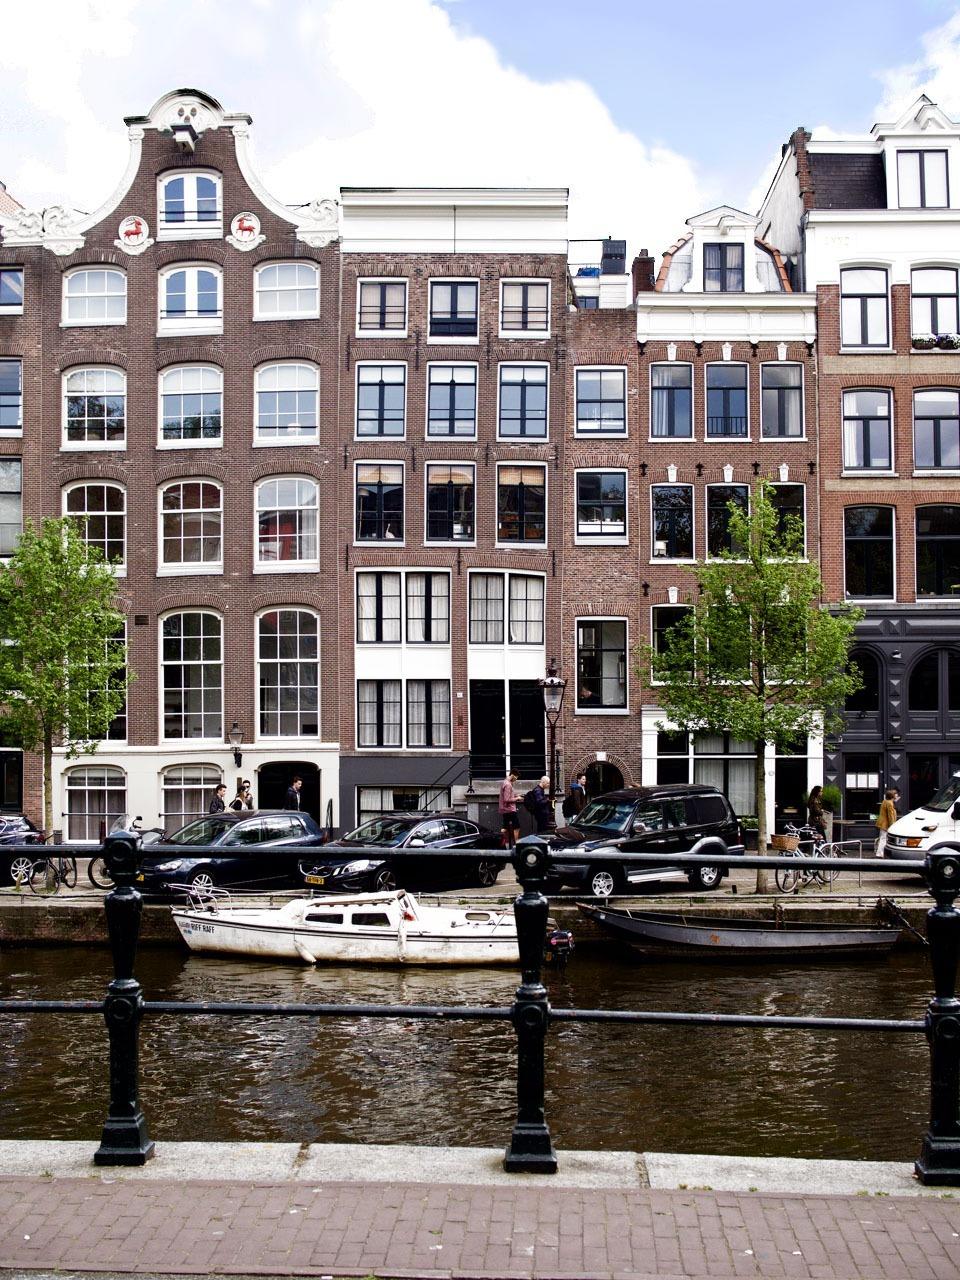 Photos of Amsterdam